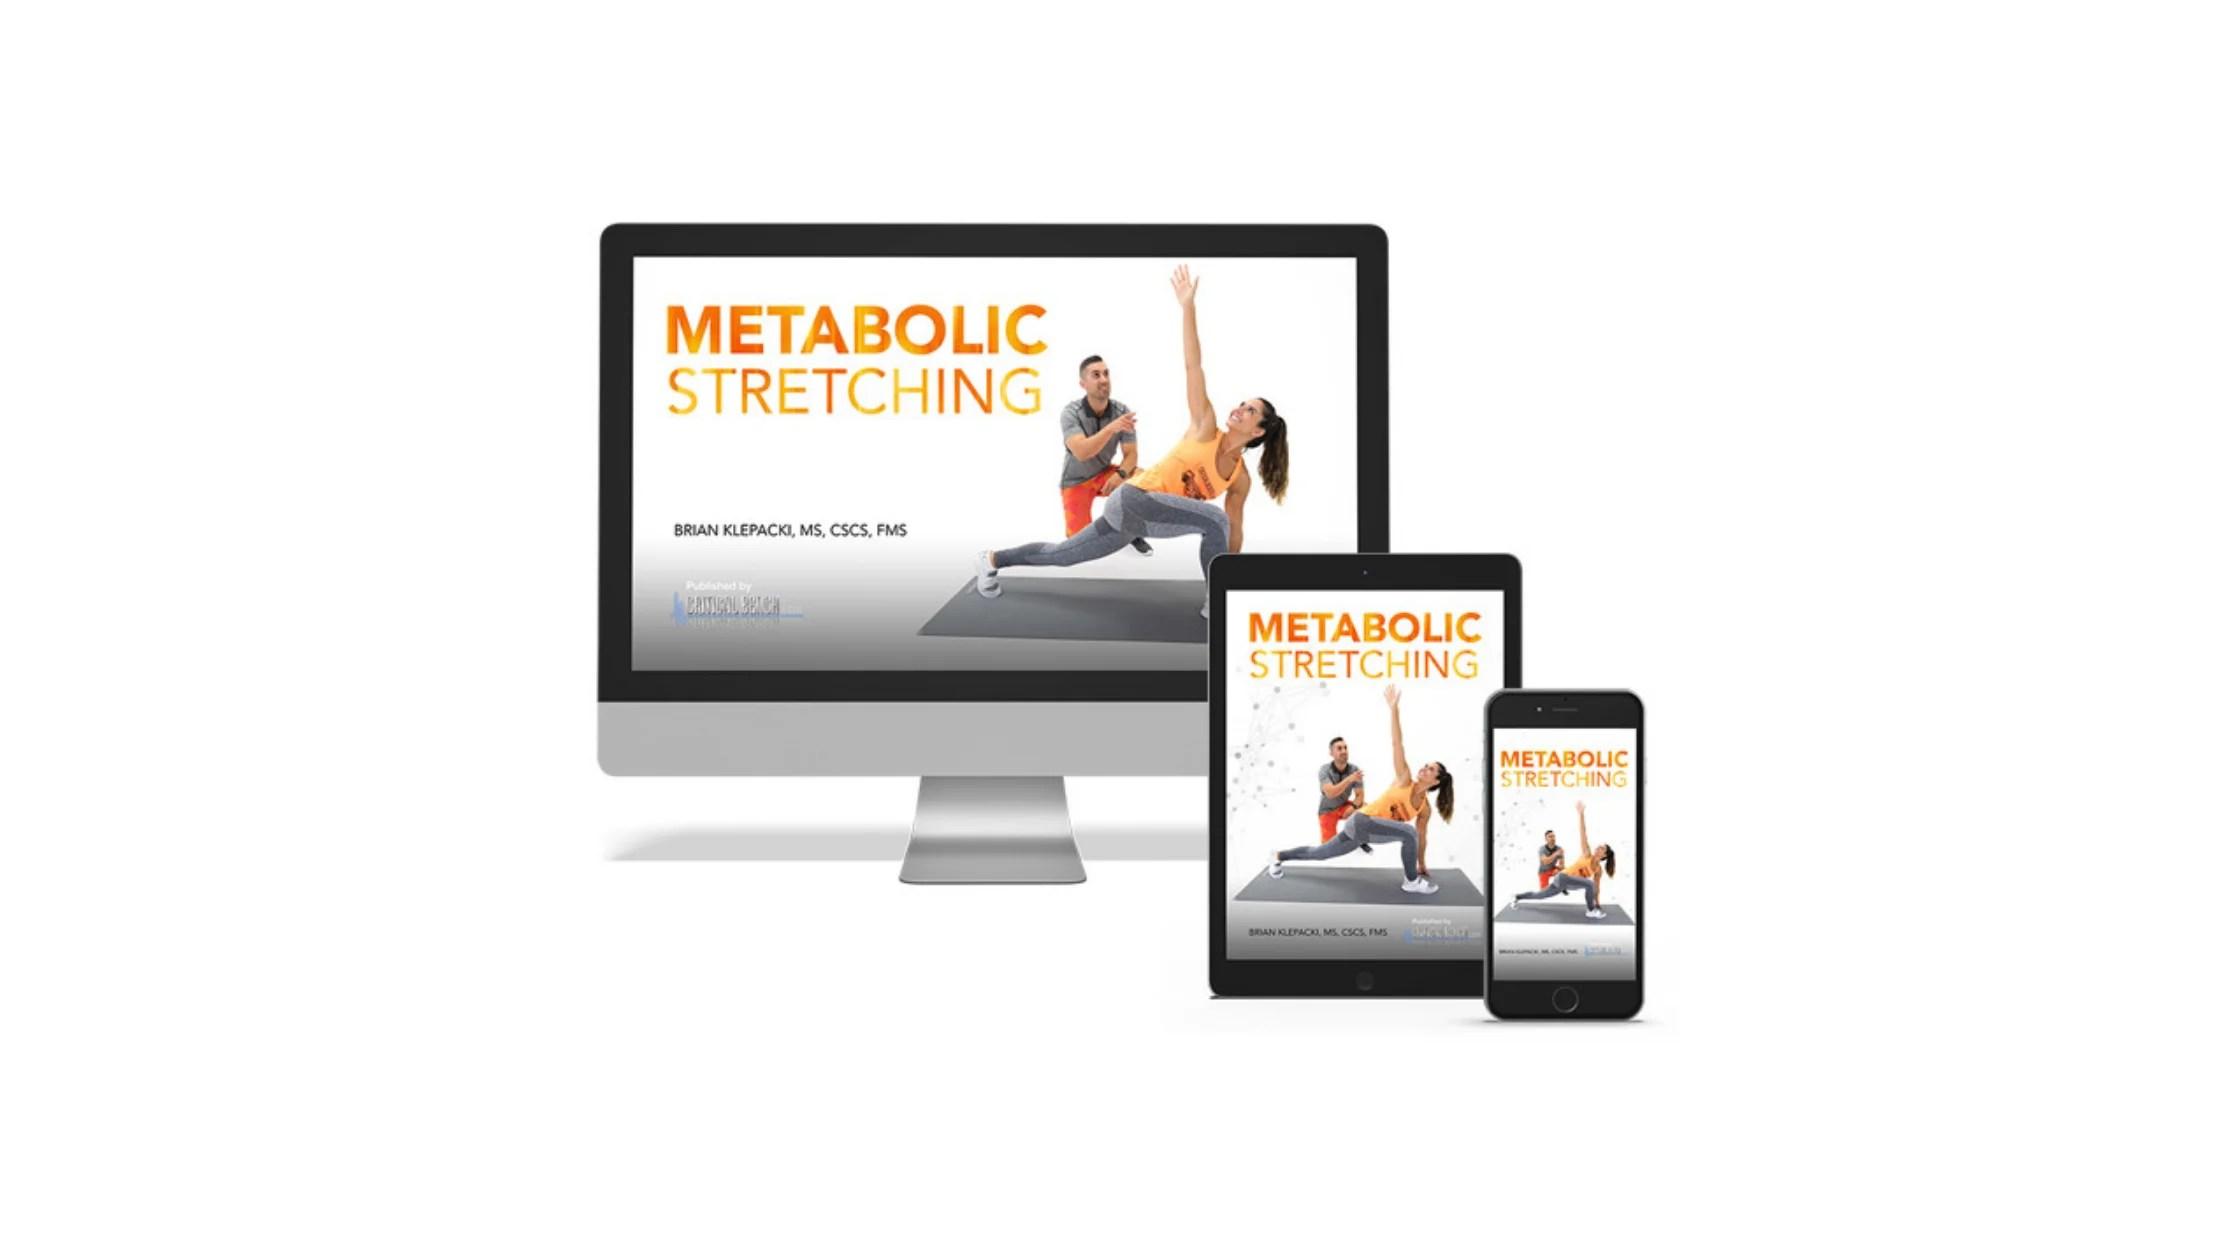 Metabolic Stretching Reviews